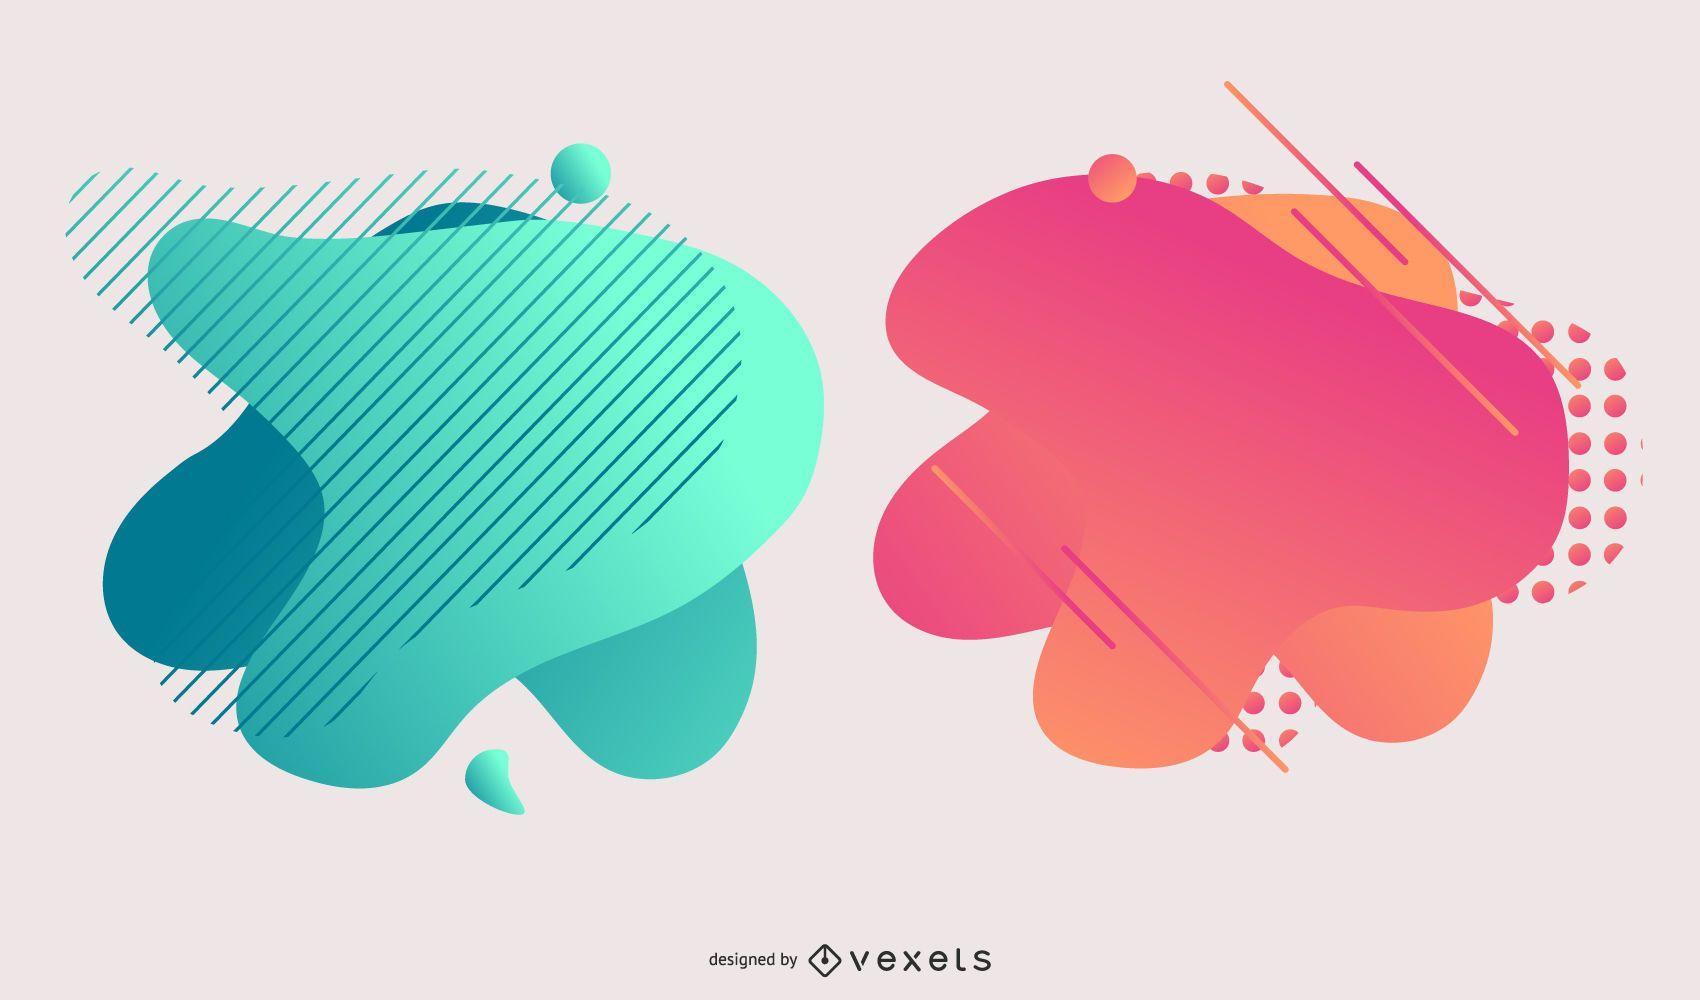 Abstract Colorful Gradient Blot Design Set